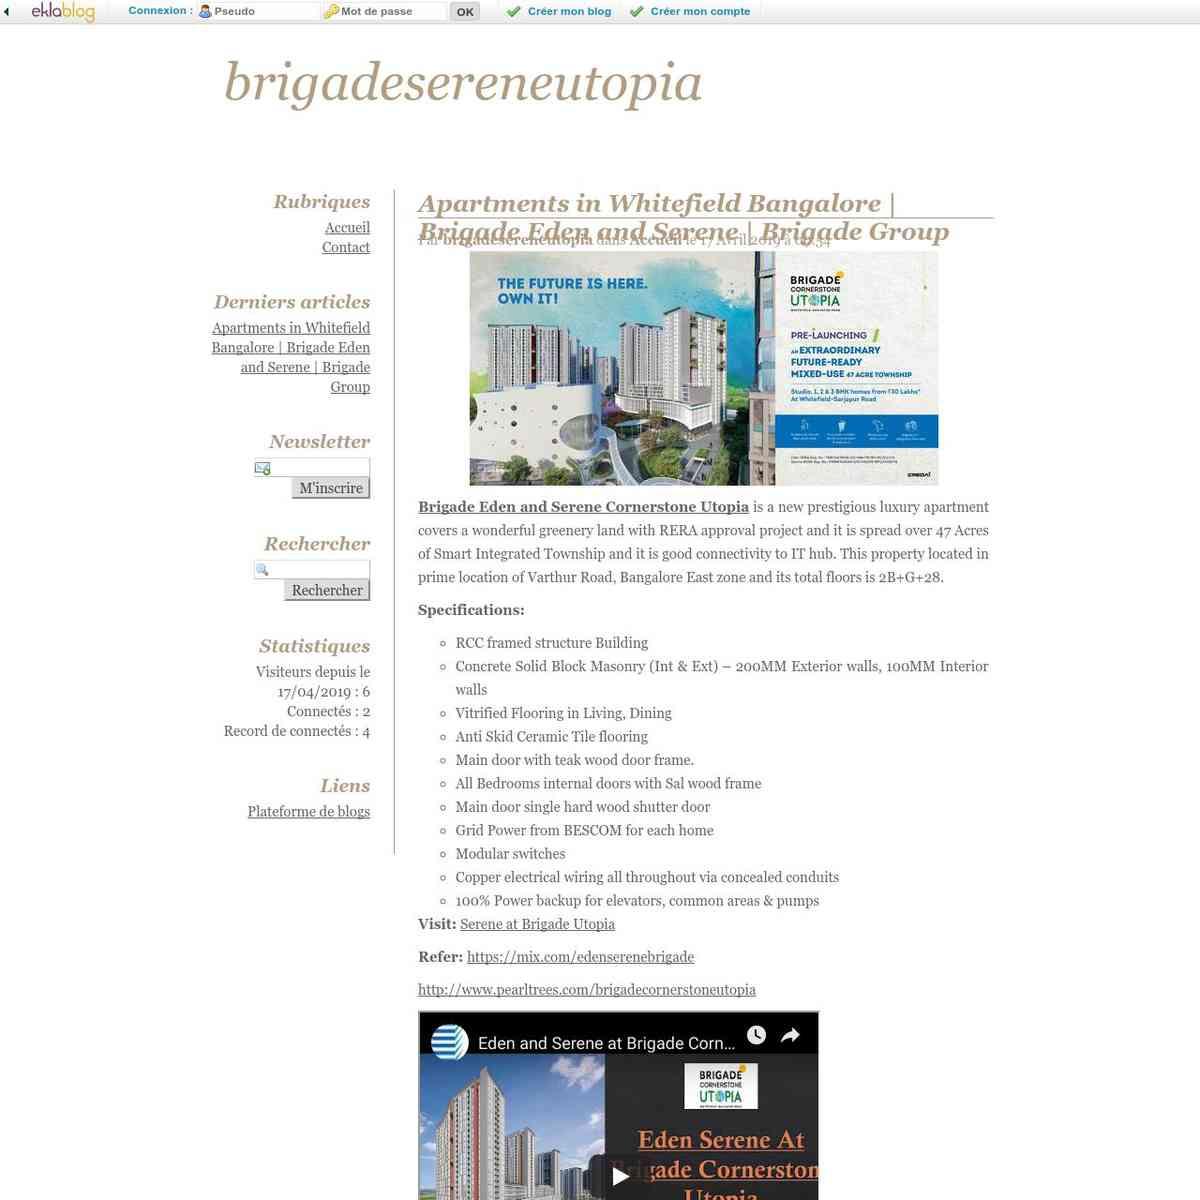 serene-eden-at-brigade-utopia.eklablog.com